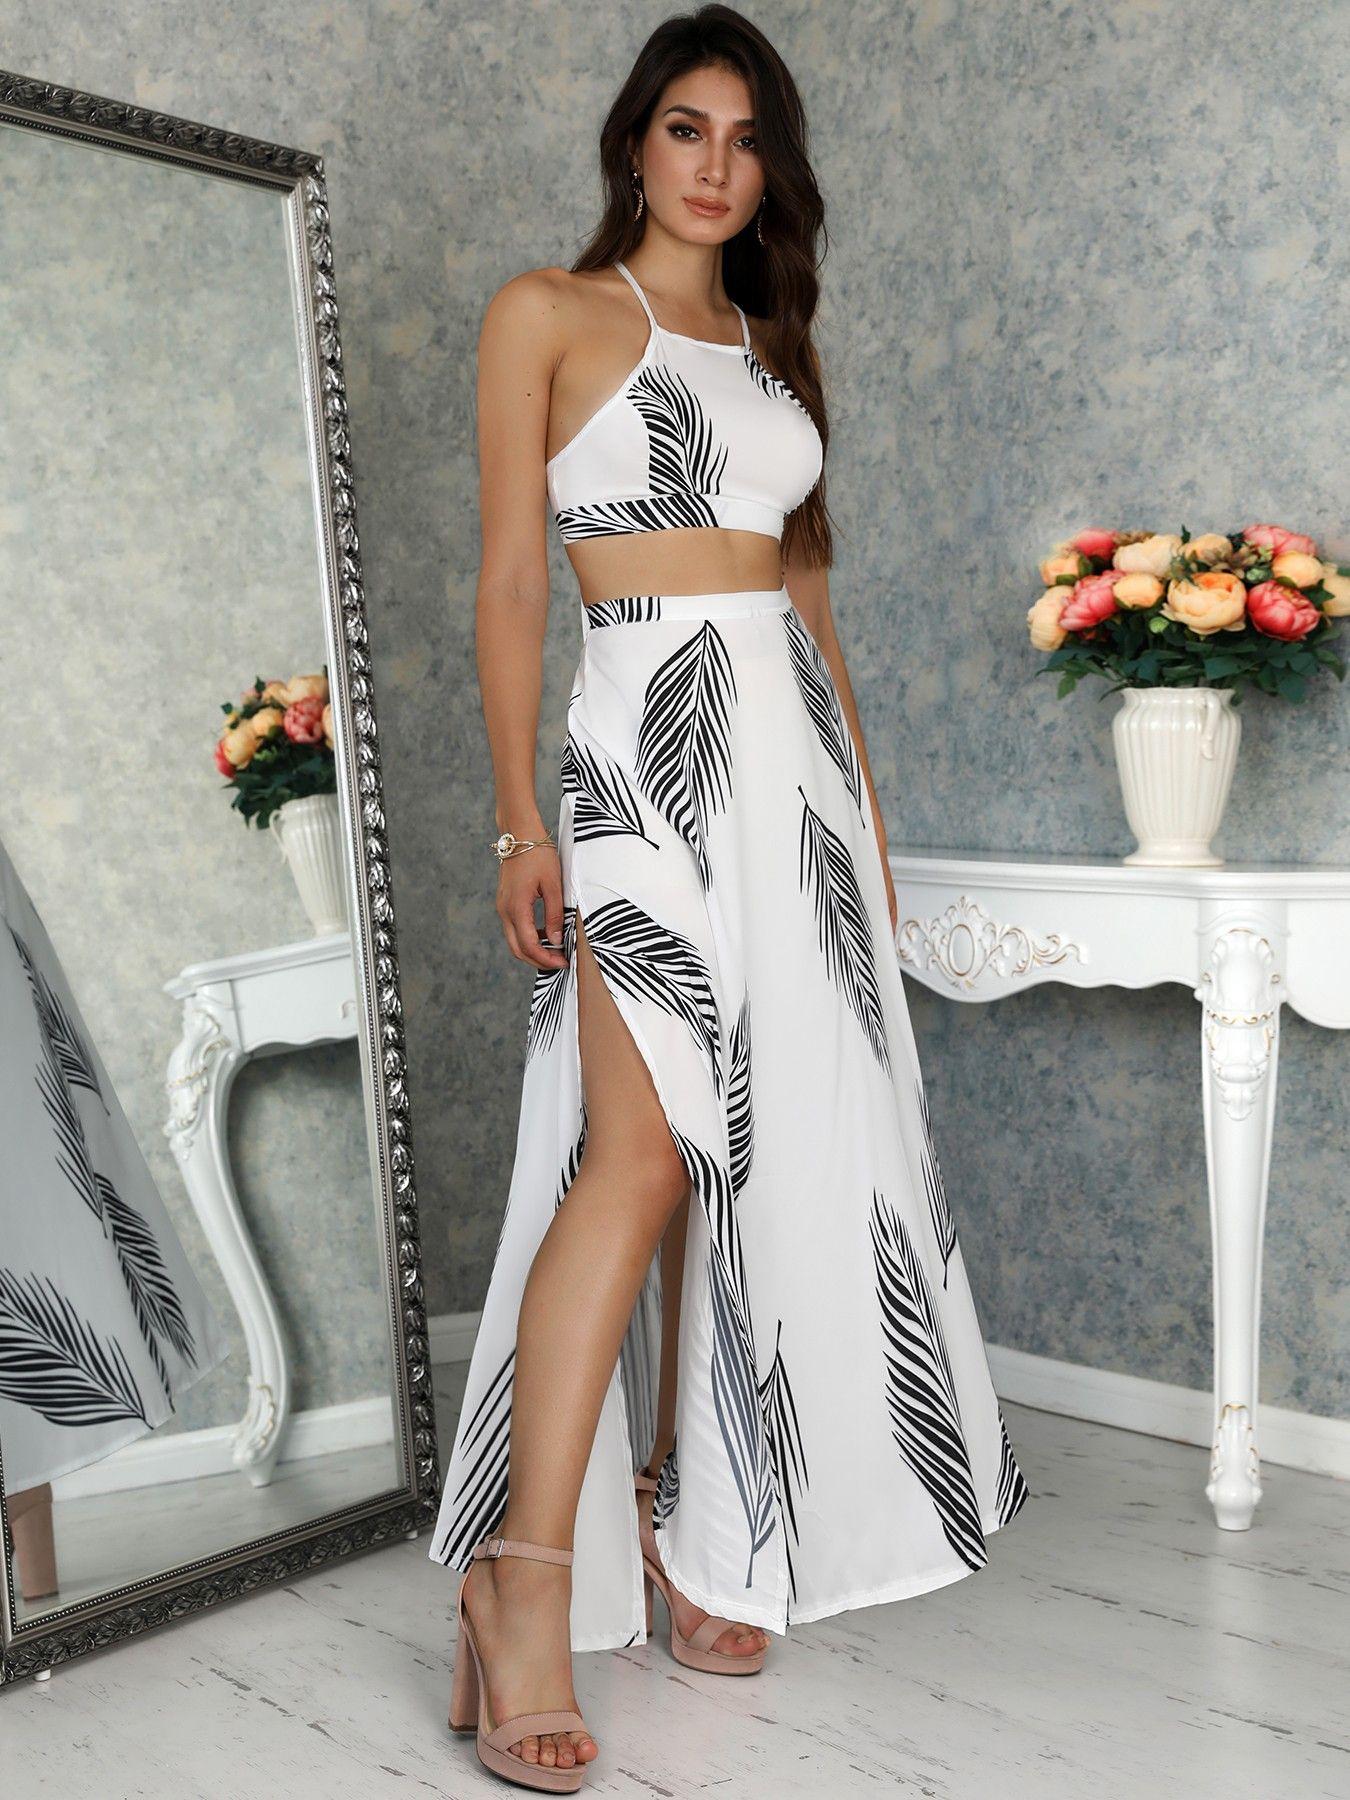 df6480c81f5 Leaf Print Backless Cami Top & Split Maxi Skirt Set   Dresses and ...